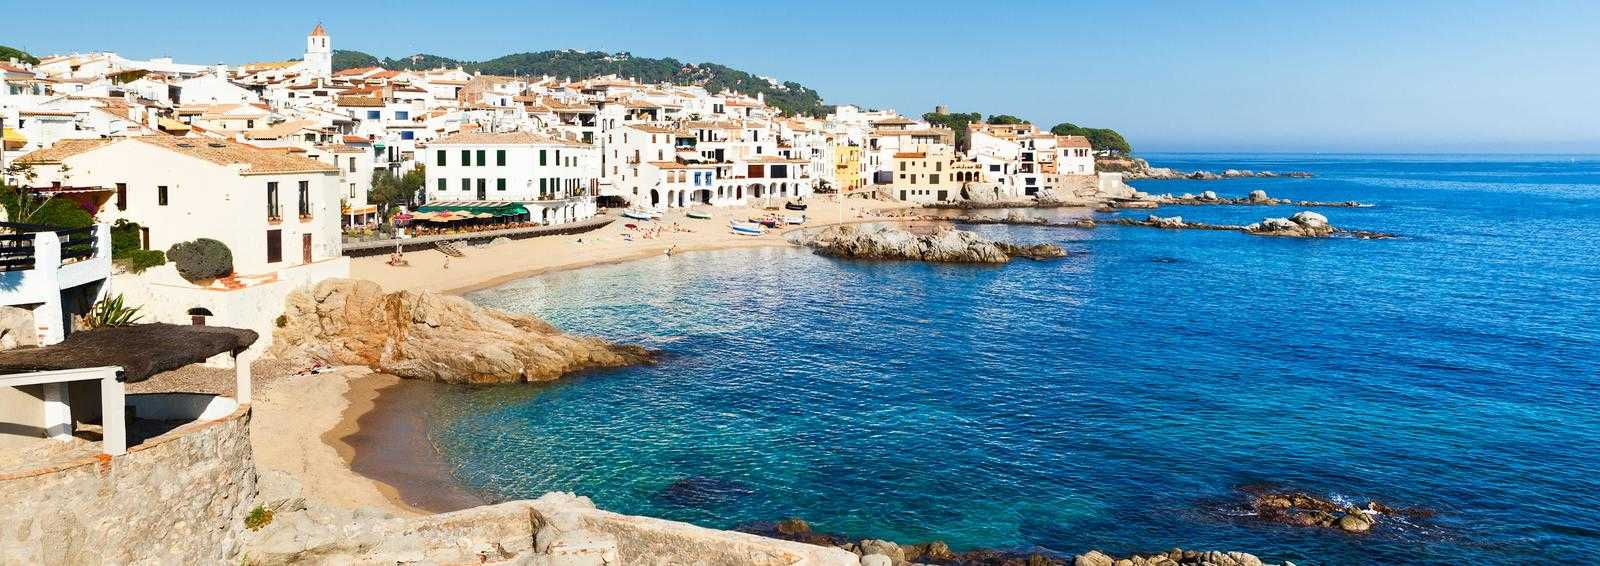 Coastline of Calella, Catalunya, Spain